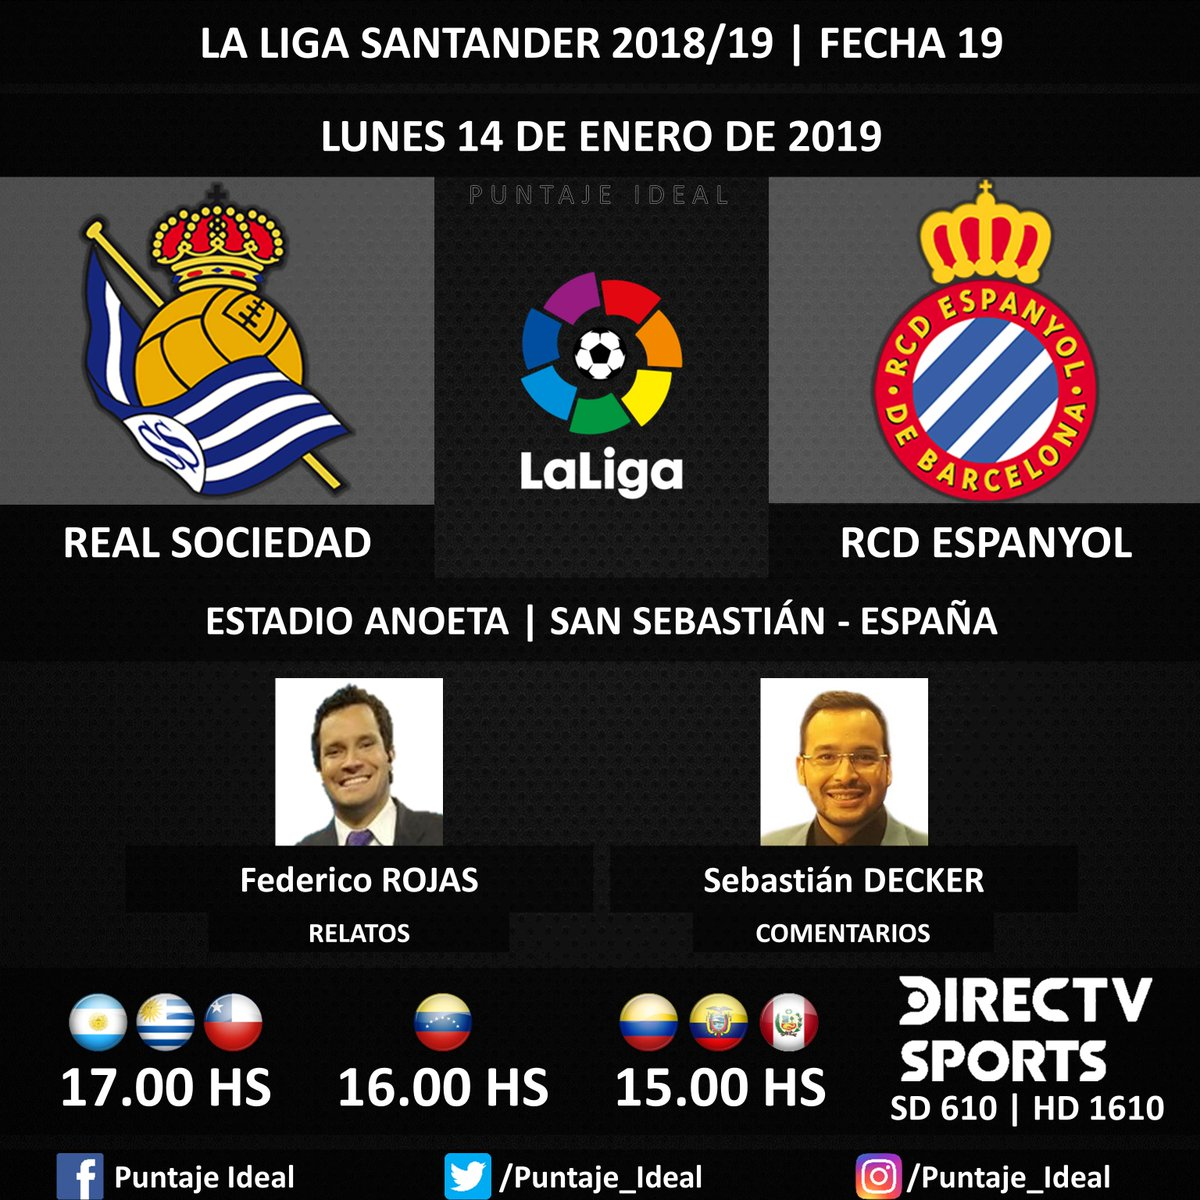 ⚽ #FútbolEnDIRECTV   #RealSociedad vs. #RCDEspanyol 🎙 Relatos: @FDVENE  🎙 Comentarios: @SebasDecker  📺 TV: @DIRECTVSports Sudamérica (610 - 1610 HD) - #Torneos 🤳 #SoySportista - #LaLiga 🇪🇸 - #RealSociedadEspanyol  Dale RT 🔃